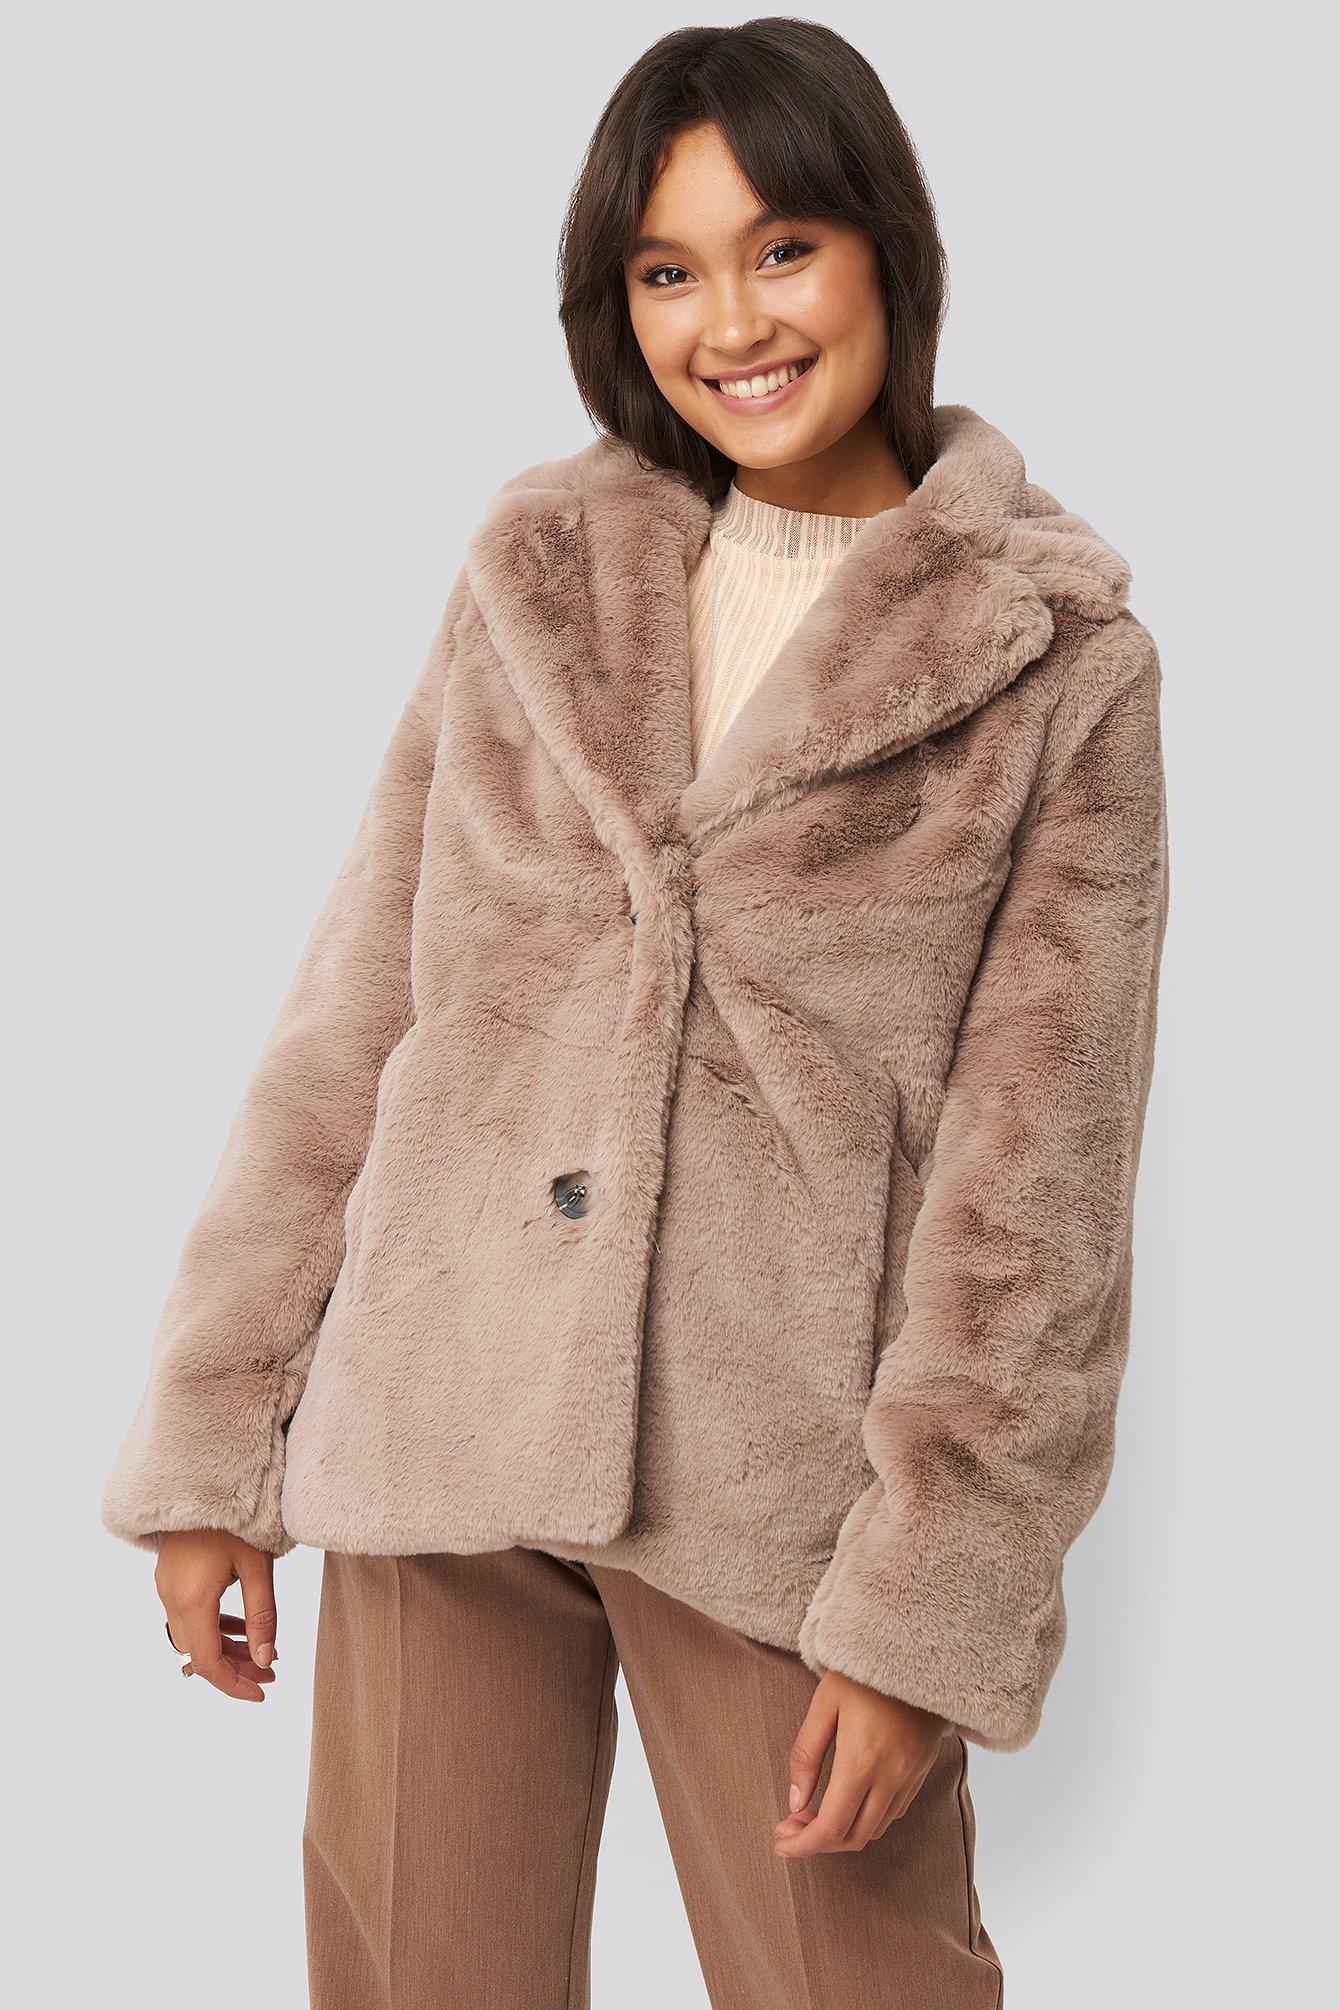 Colored Faux Fur Short Coat Beige   na-kd.com